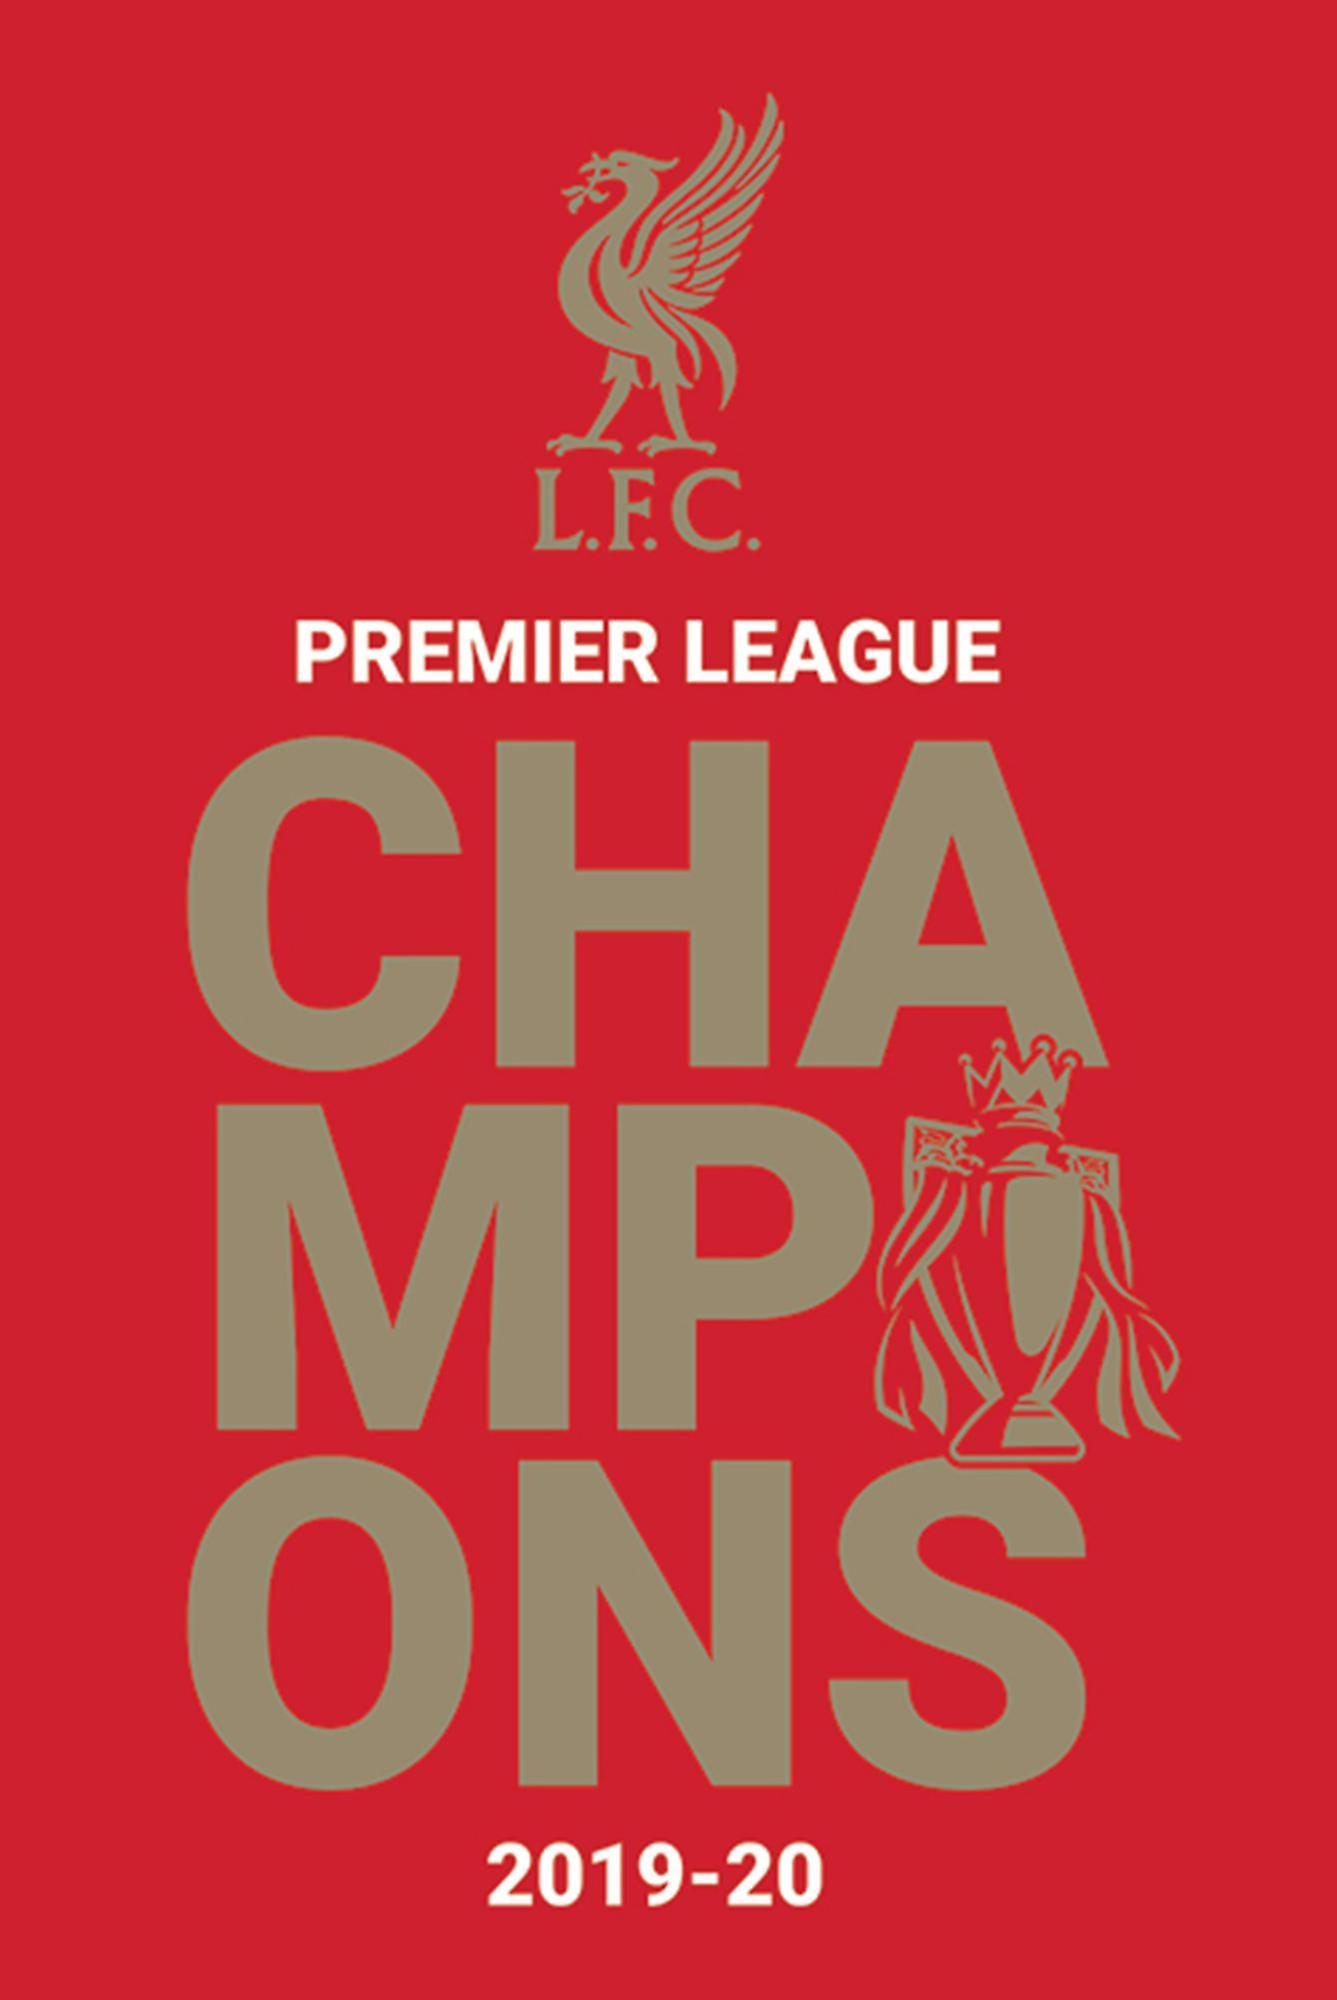 Liverpool FC Poster Logo P. L. Champions 2019/2020 | Fruugo US